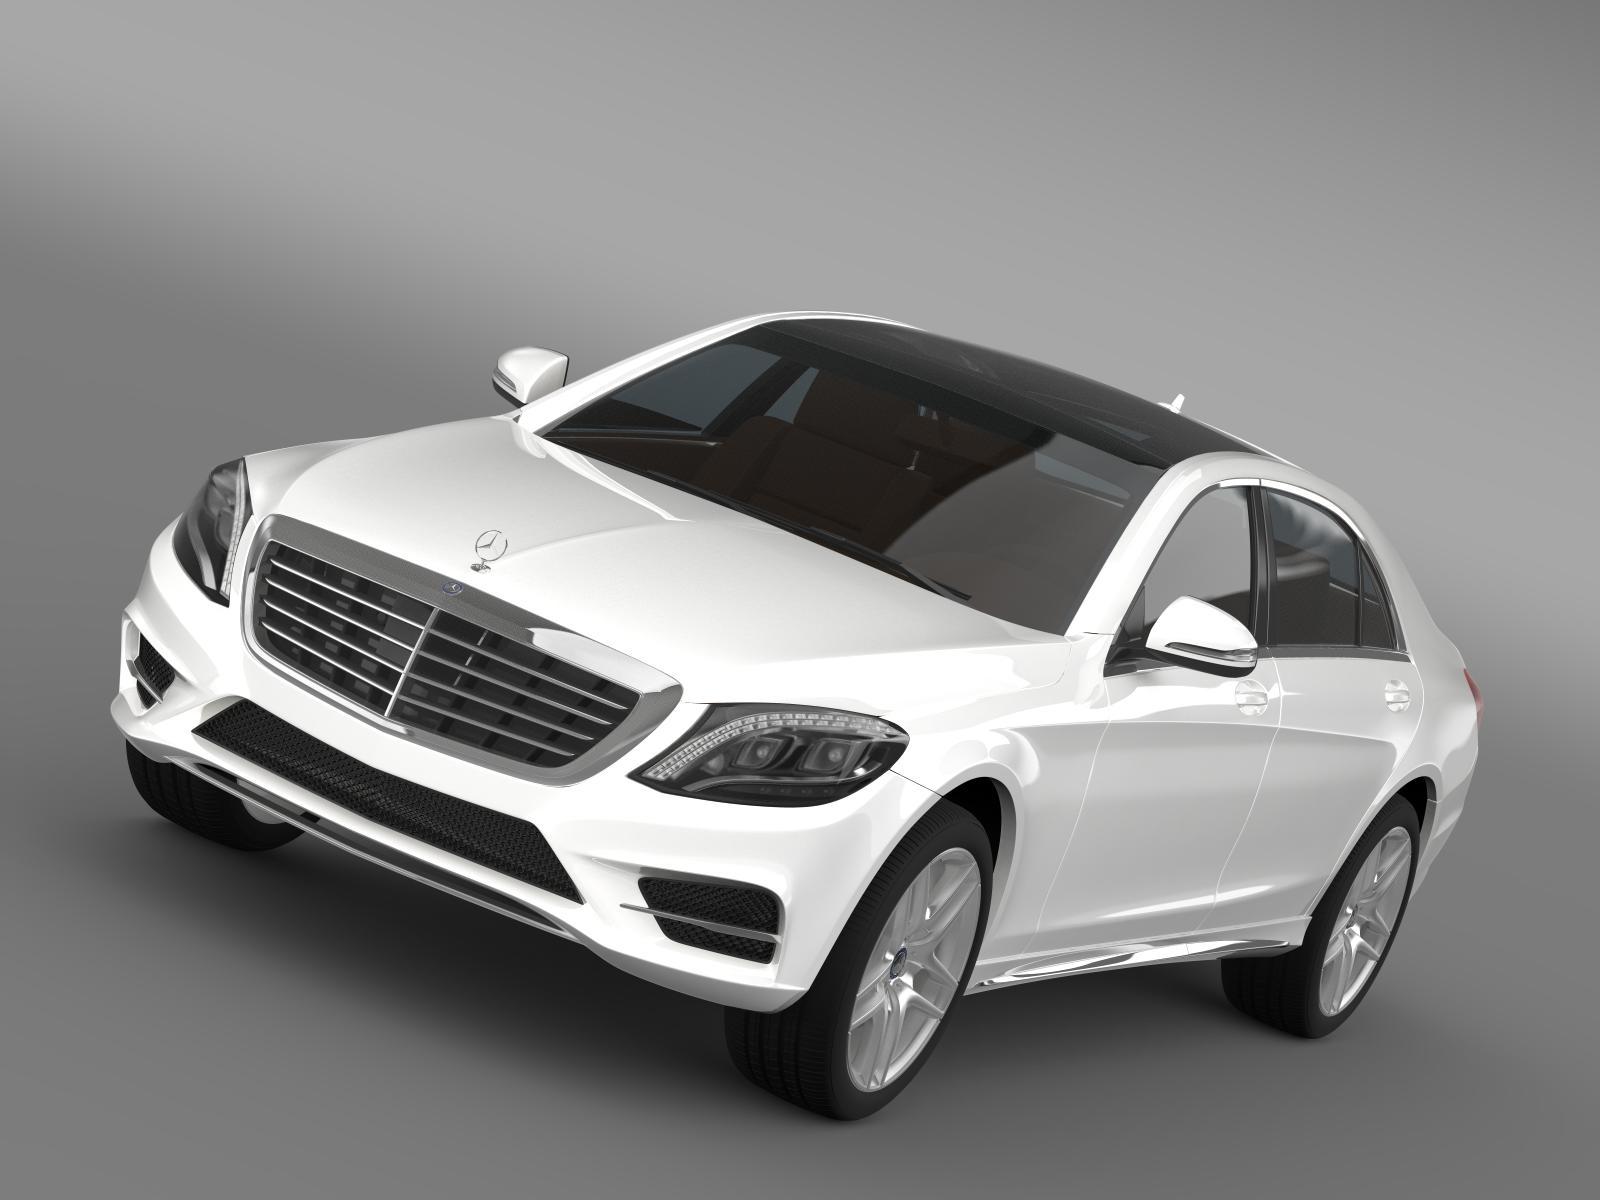 mercedes benz s 300 bluetec hybrid w222 2013 3d model 3ds fbx c4d lwo ma mb hrc xsi obj 204728